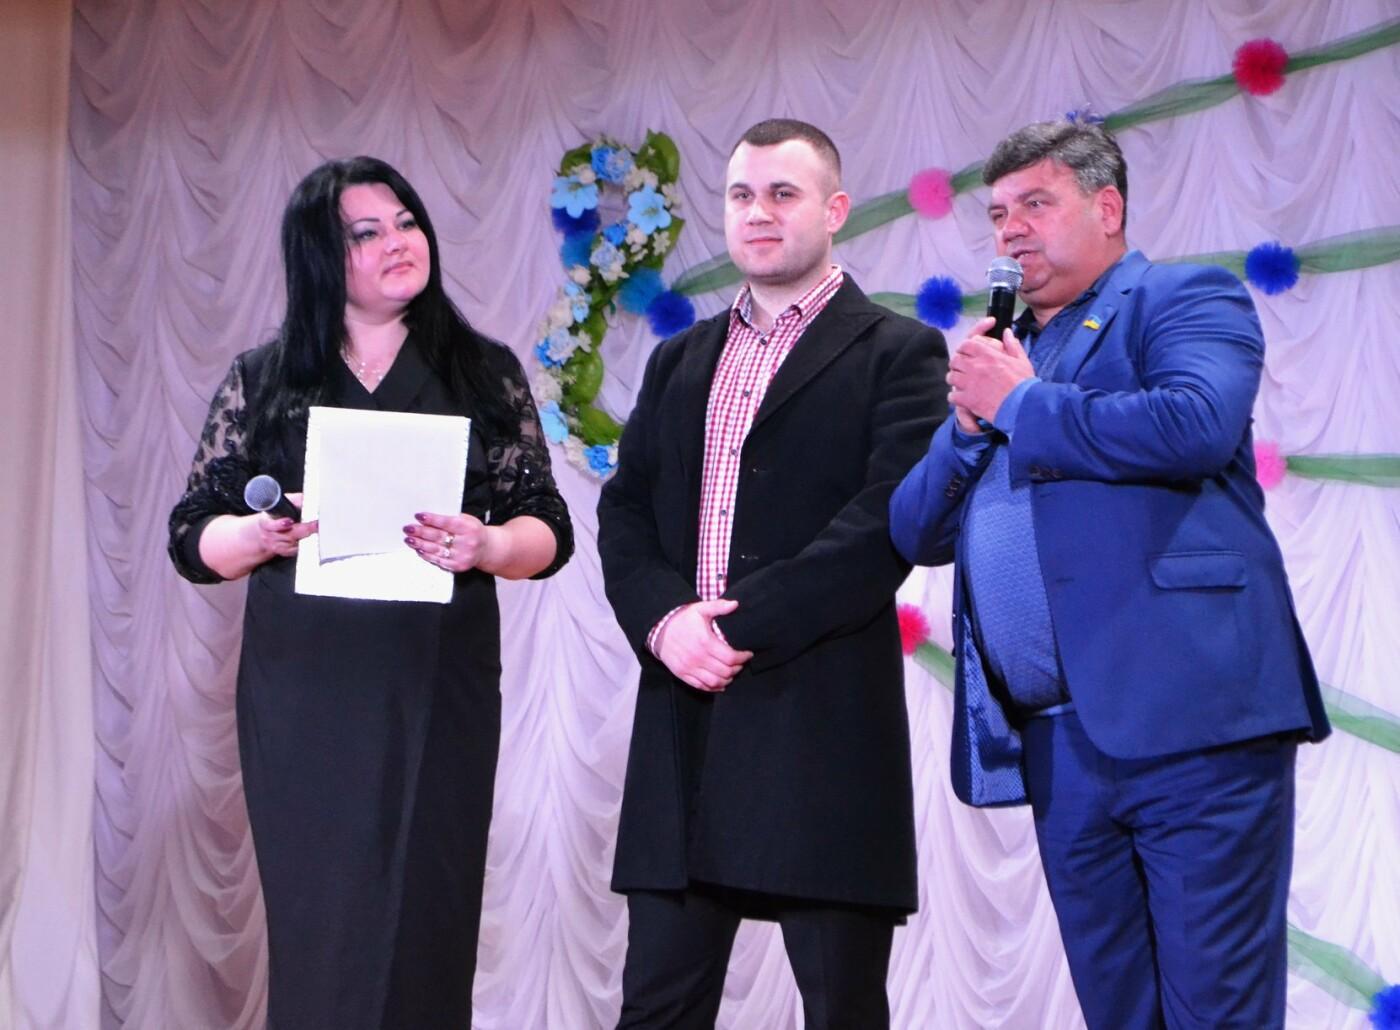 В селе Малодолинское поздравили женщин с 8 Марта, фото-8